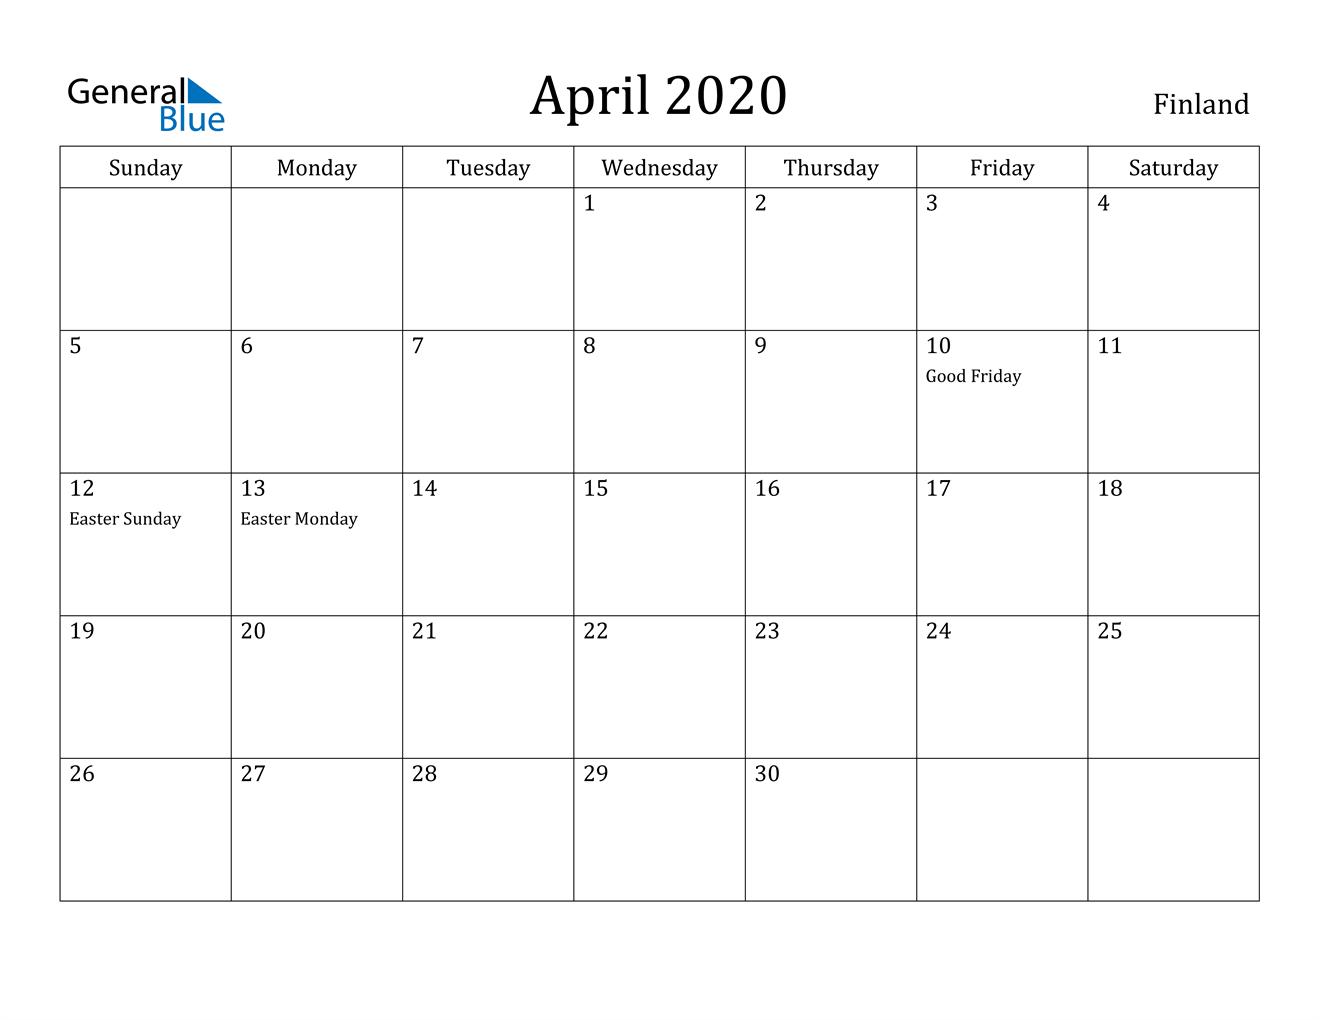 Image of April 2020 Finland Calendar with Holidays Calendar